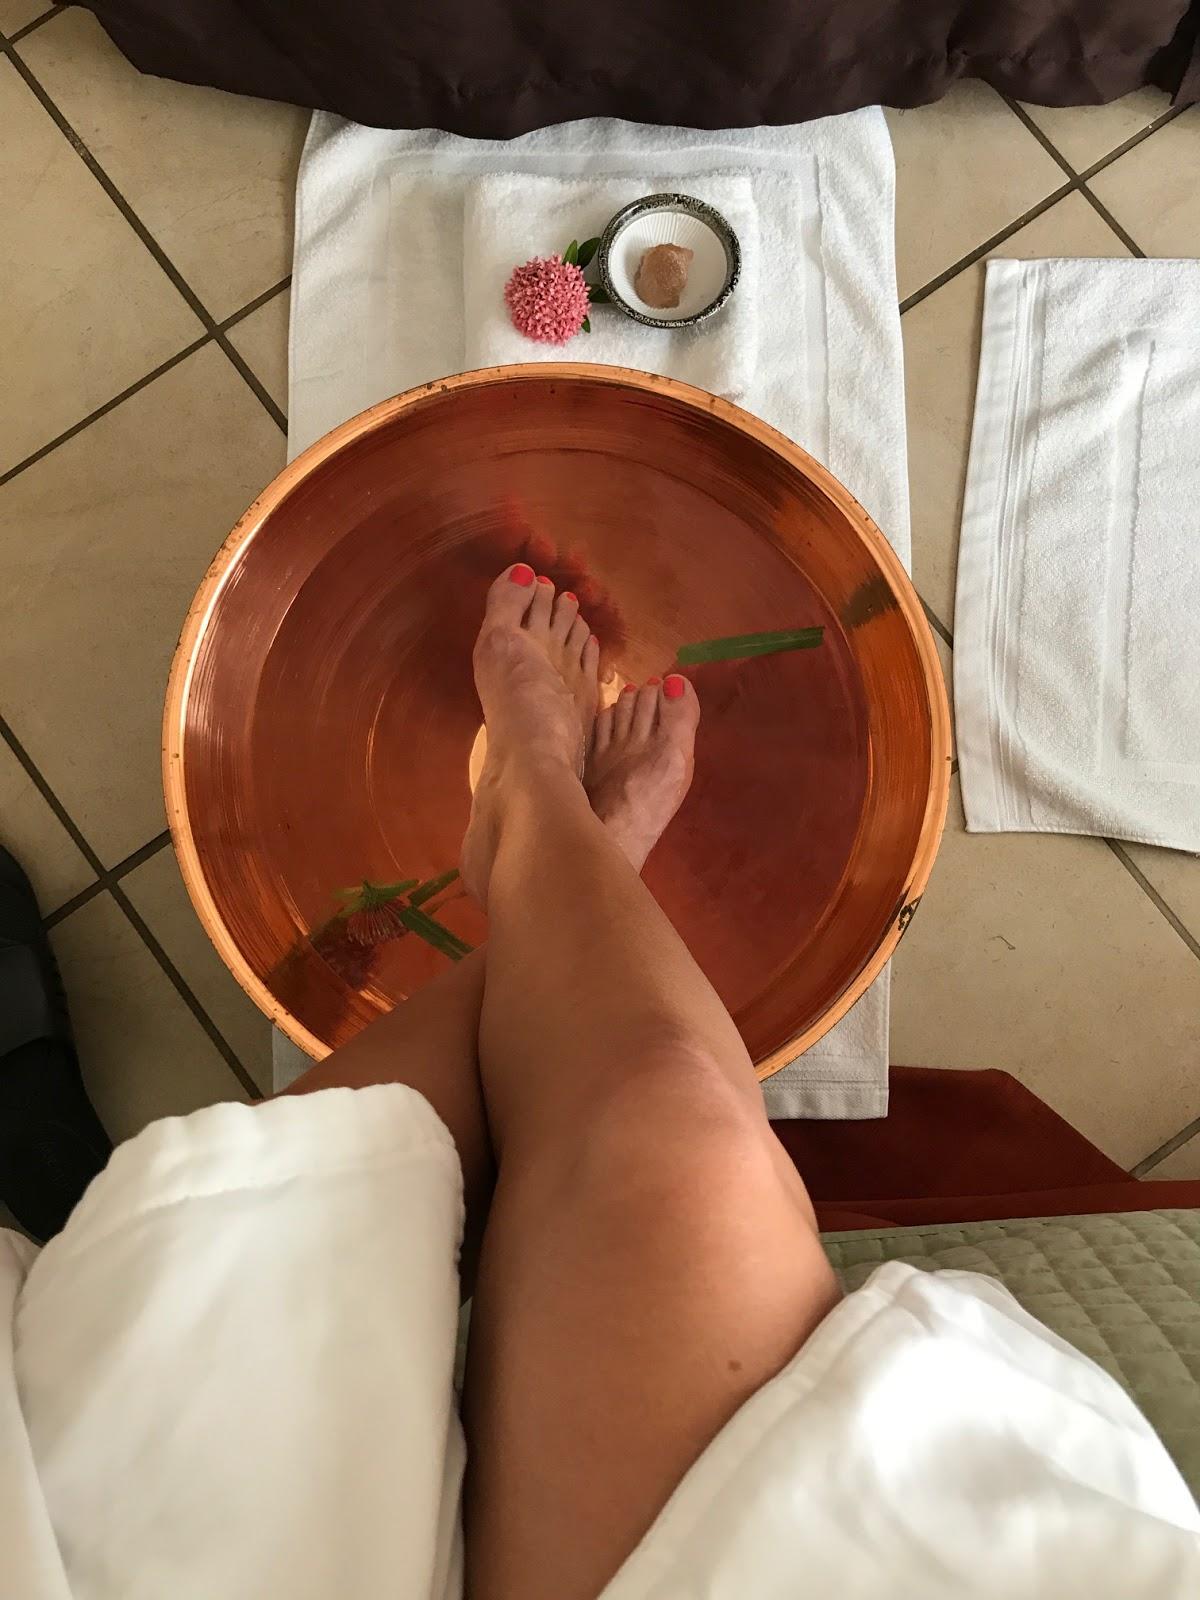 the foot soak ritual during the Nevisian massage